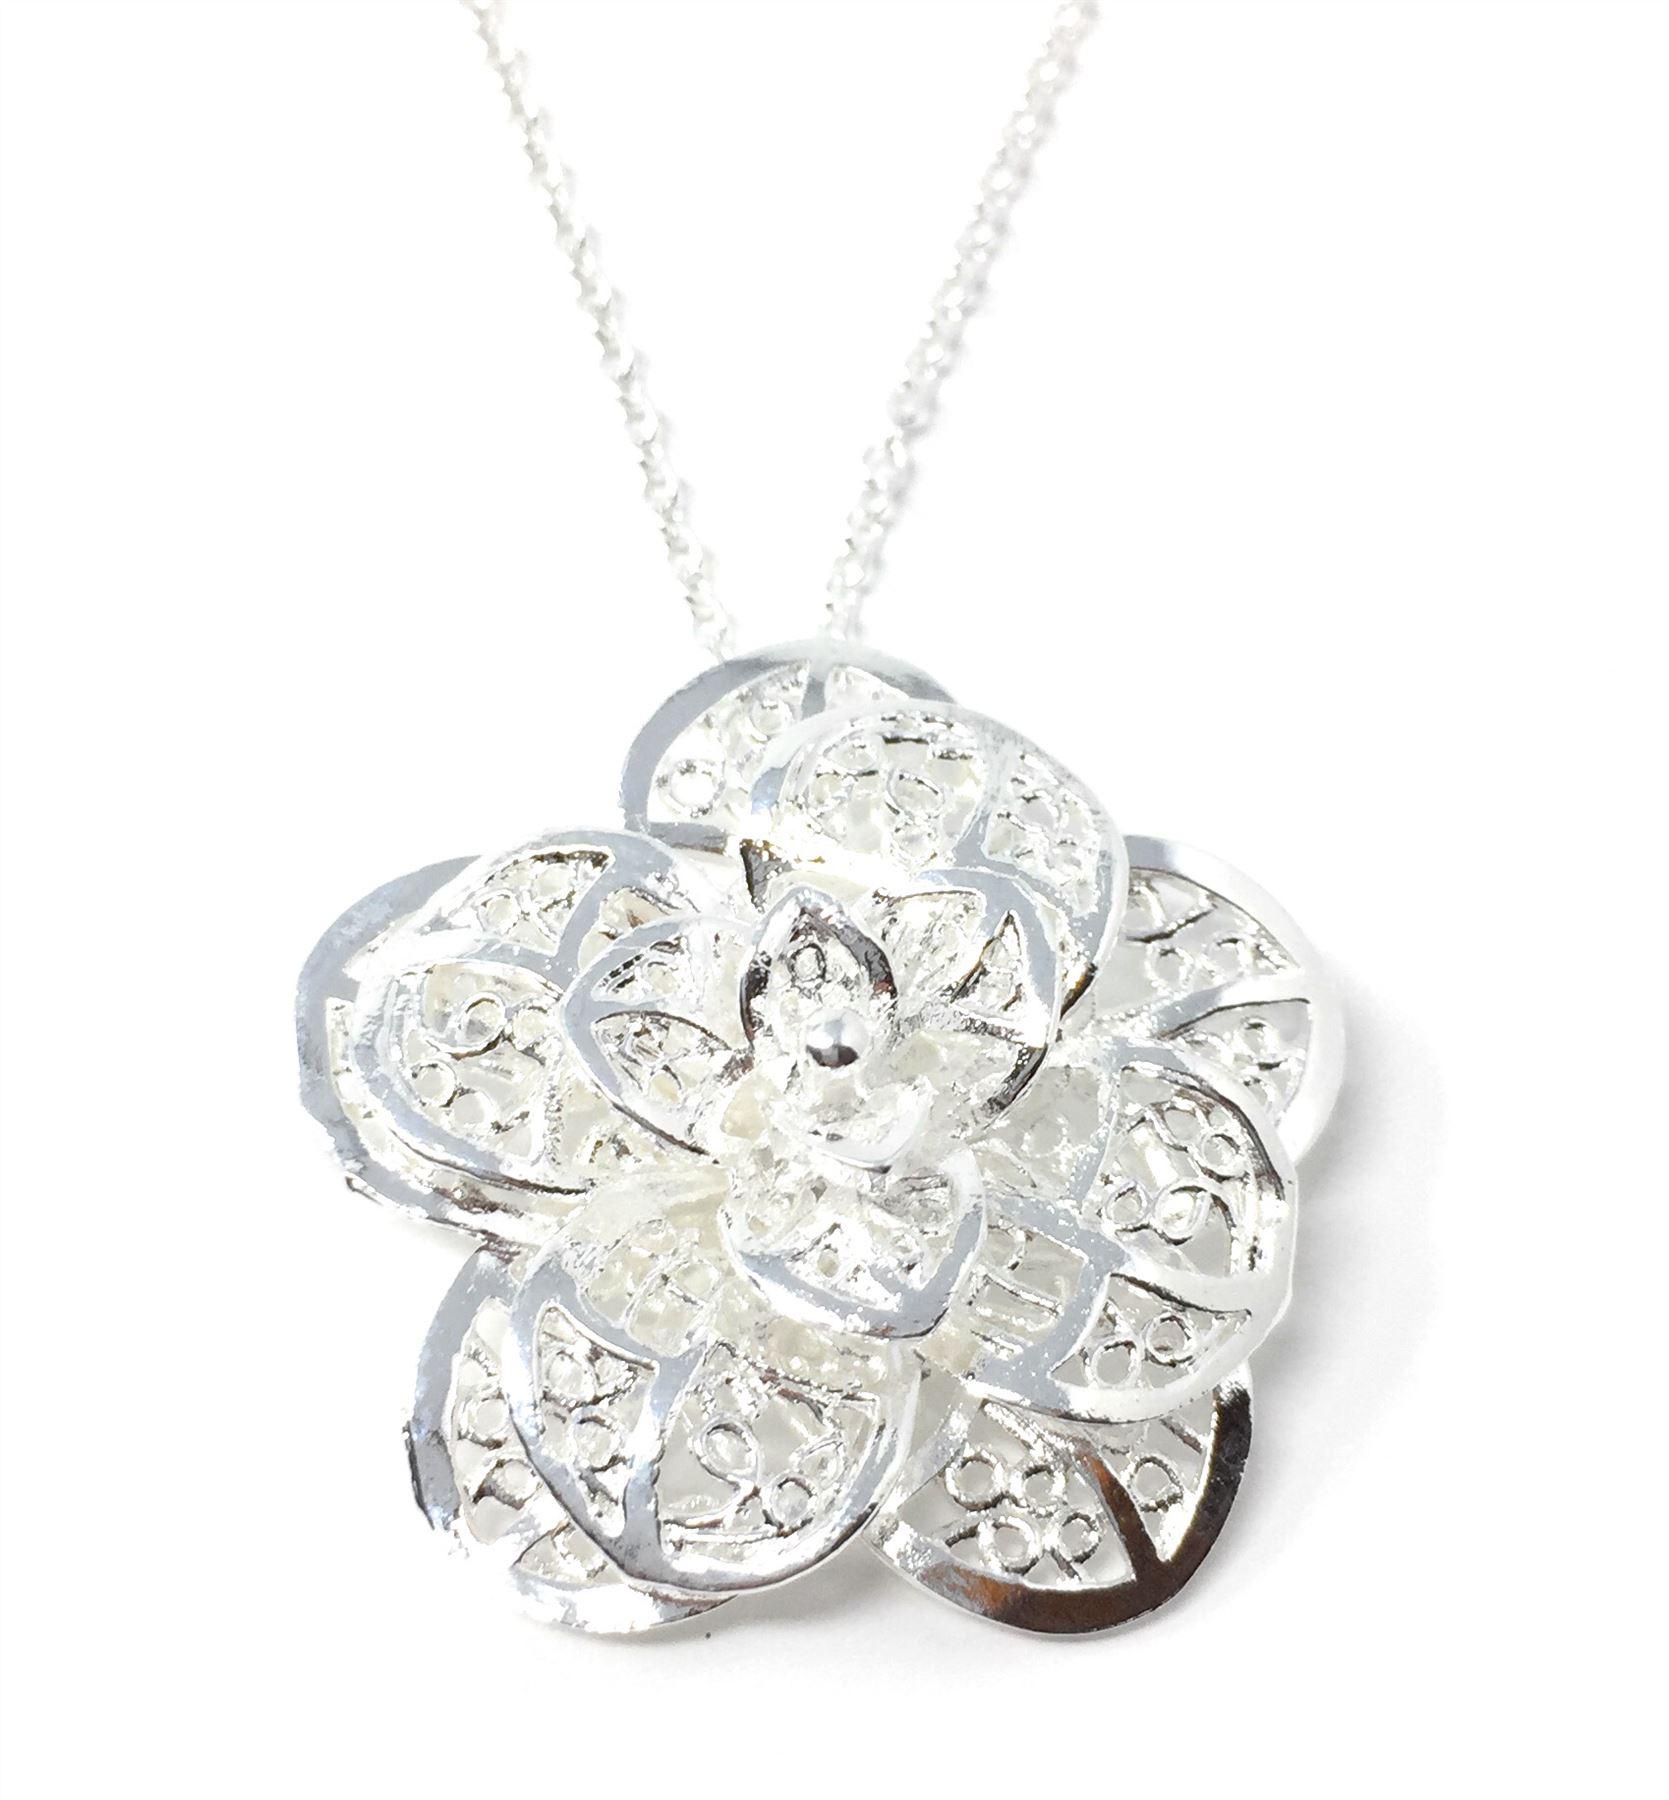 Reino-Unido-925-de-Plata-Colgante-Collar-18-034-pulgadas-cadena-Plt-Senoras-Para-Mujer-Regalo-larga miniatura 11